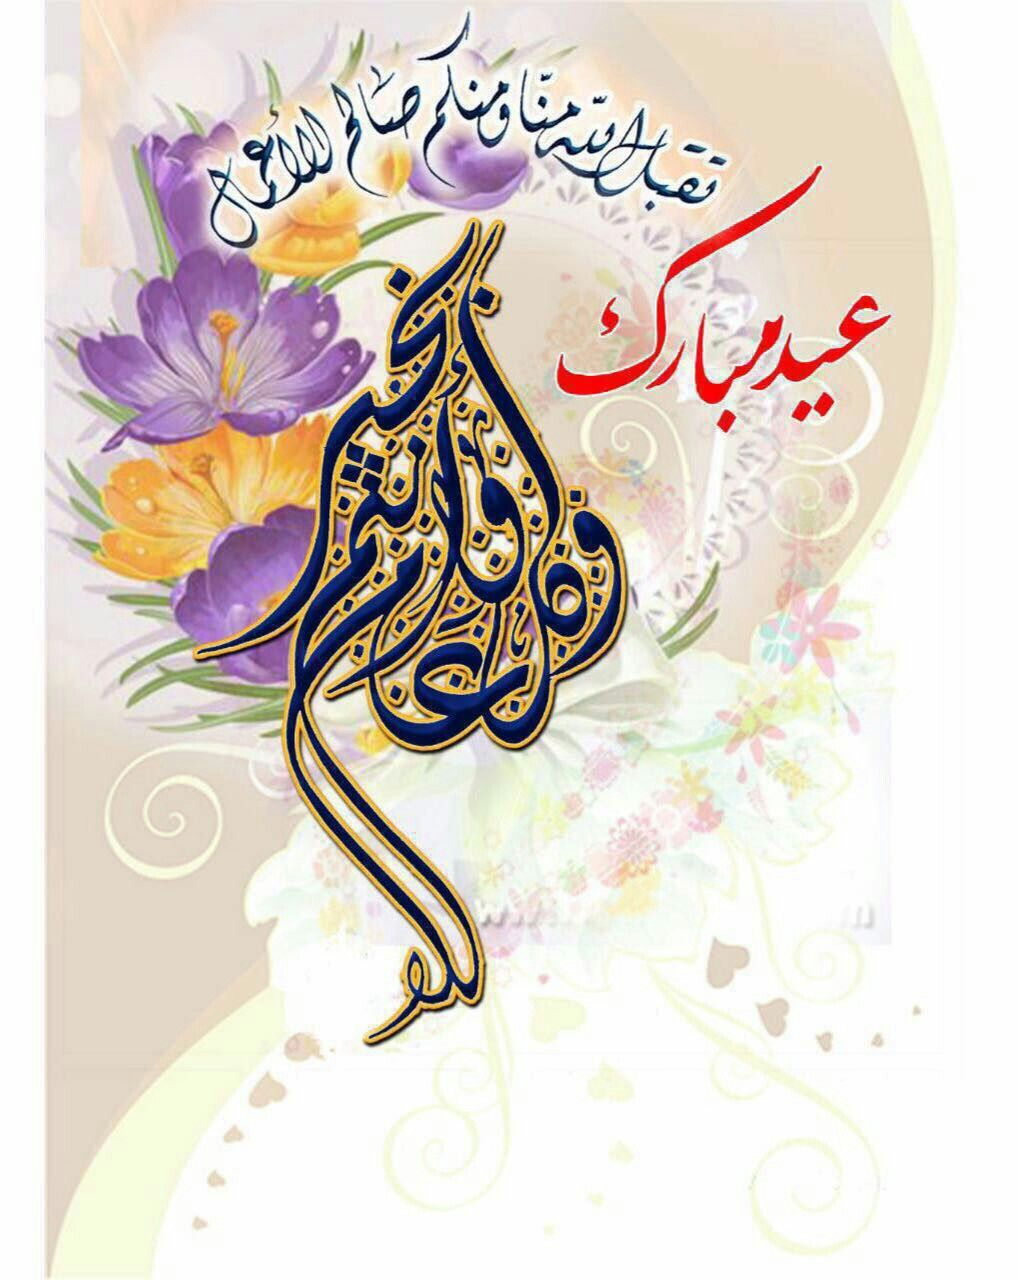 عيدكم مبارك عيد سعيد Eid Mubarak Card Eid Mubarak Decoration Eid Greetings